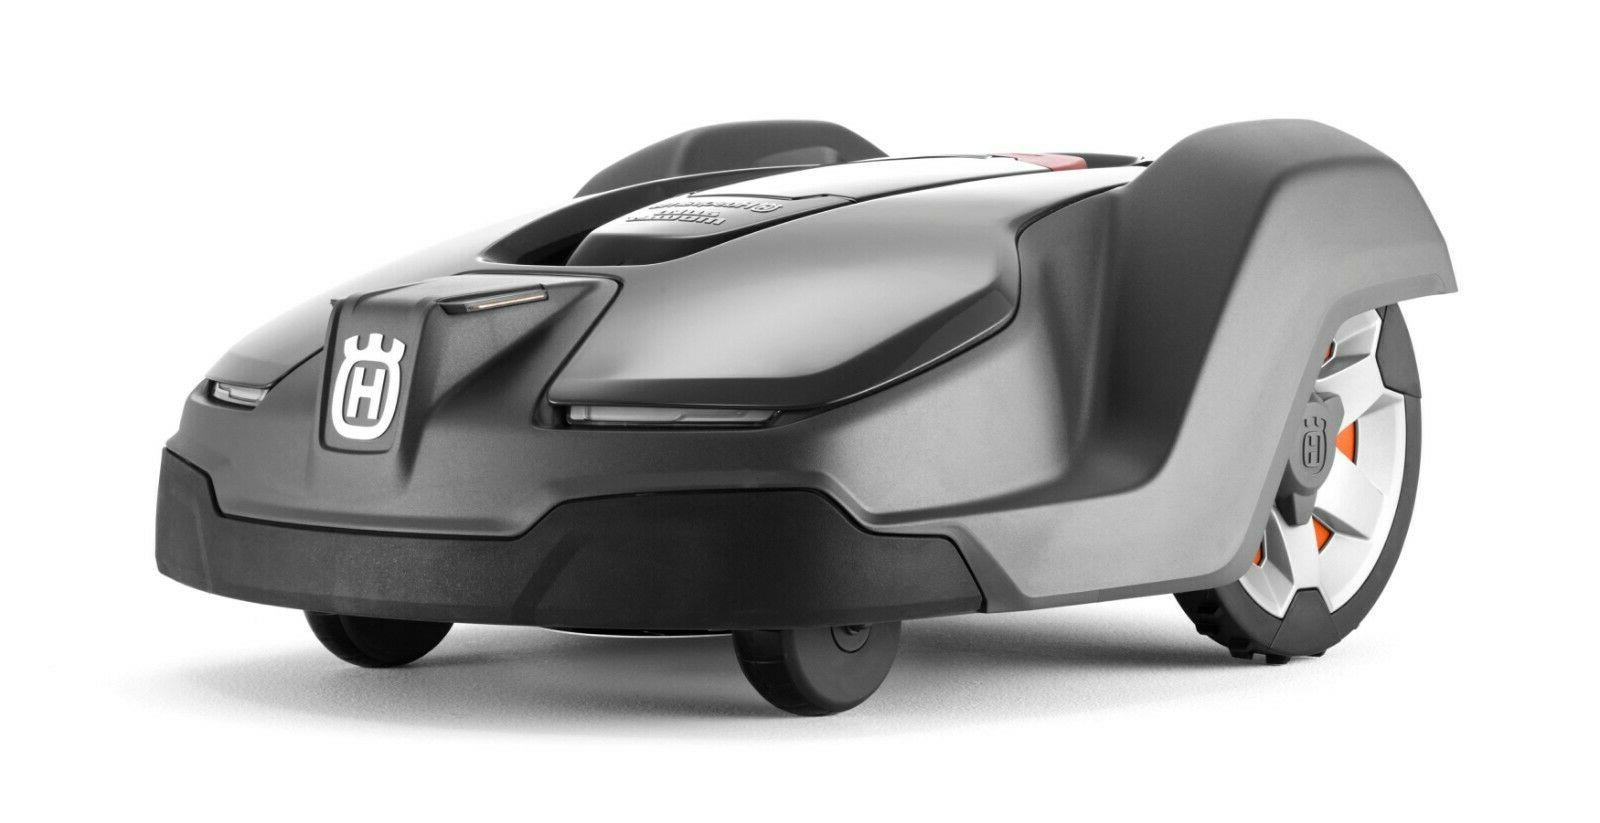 2018 model 430x automower free large install